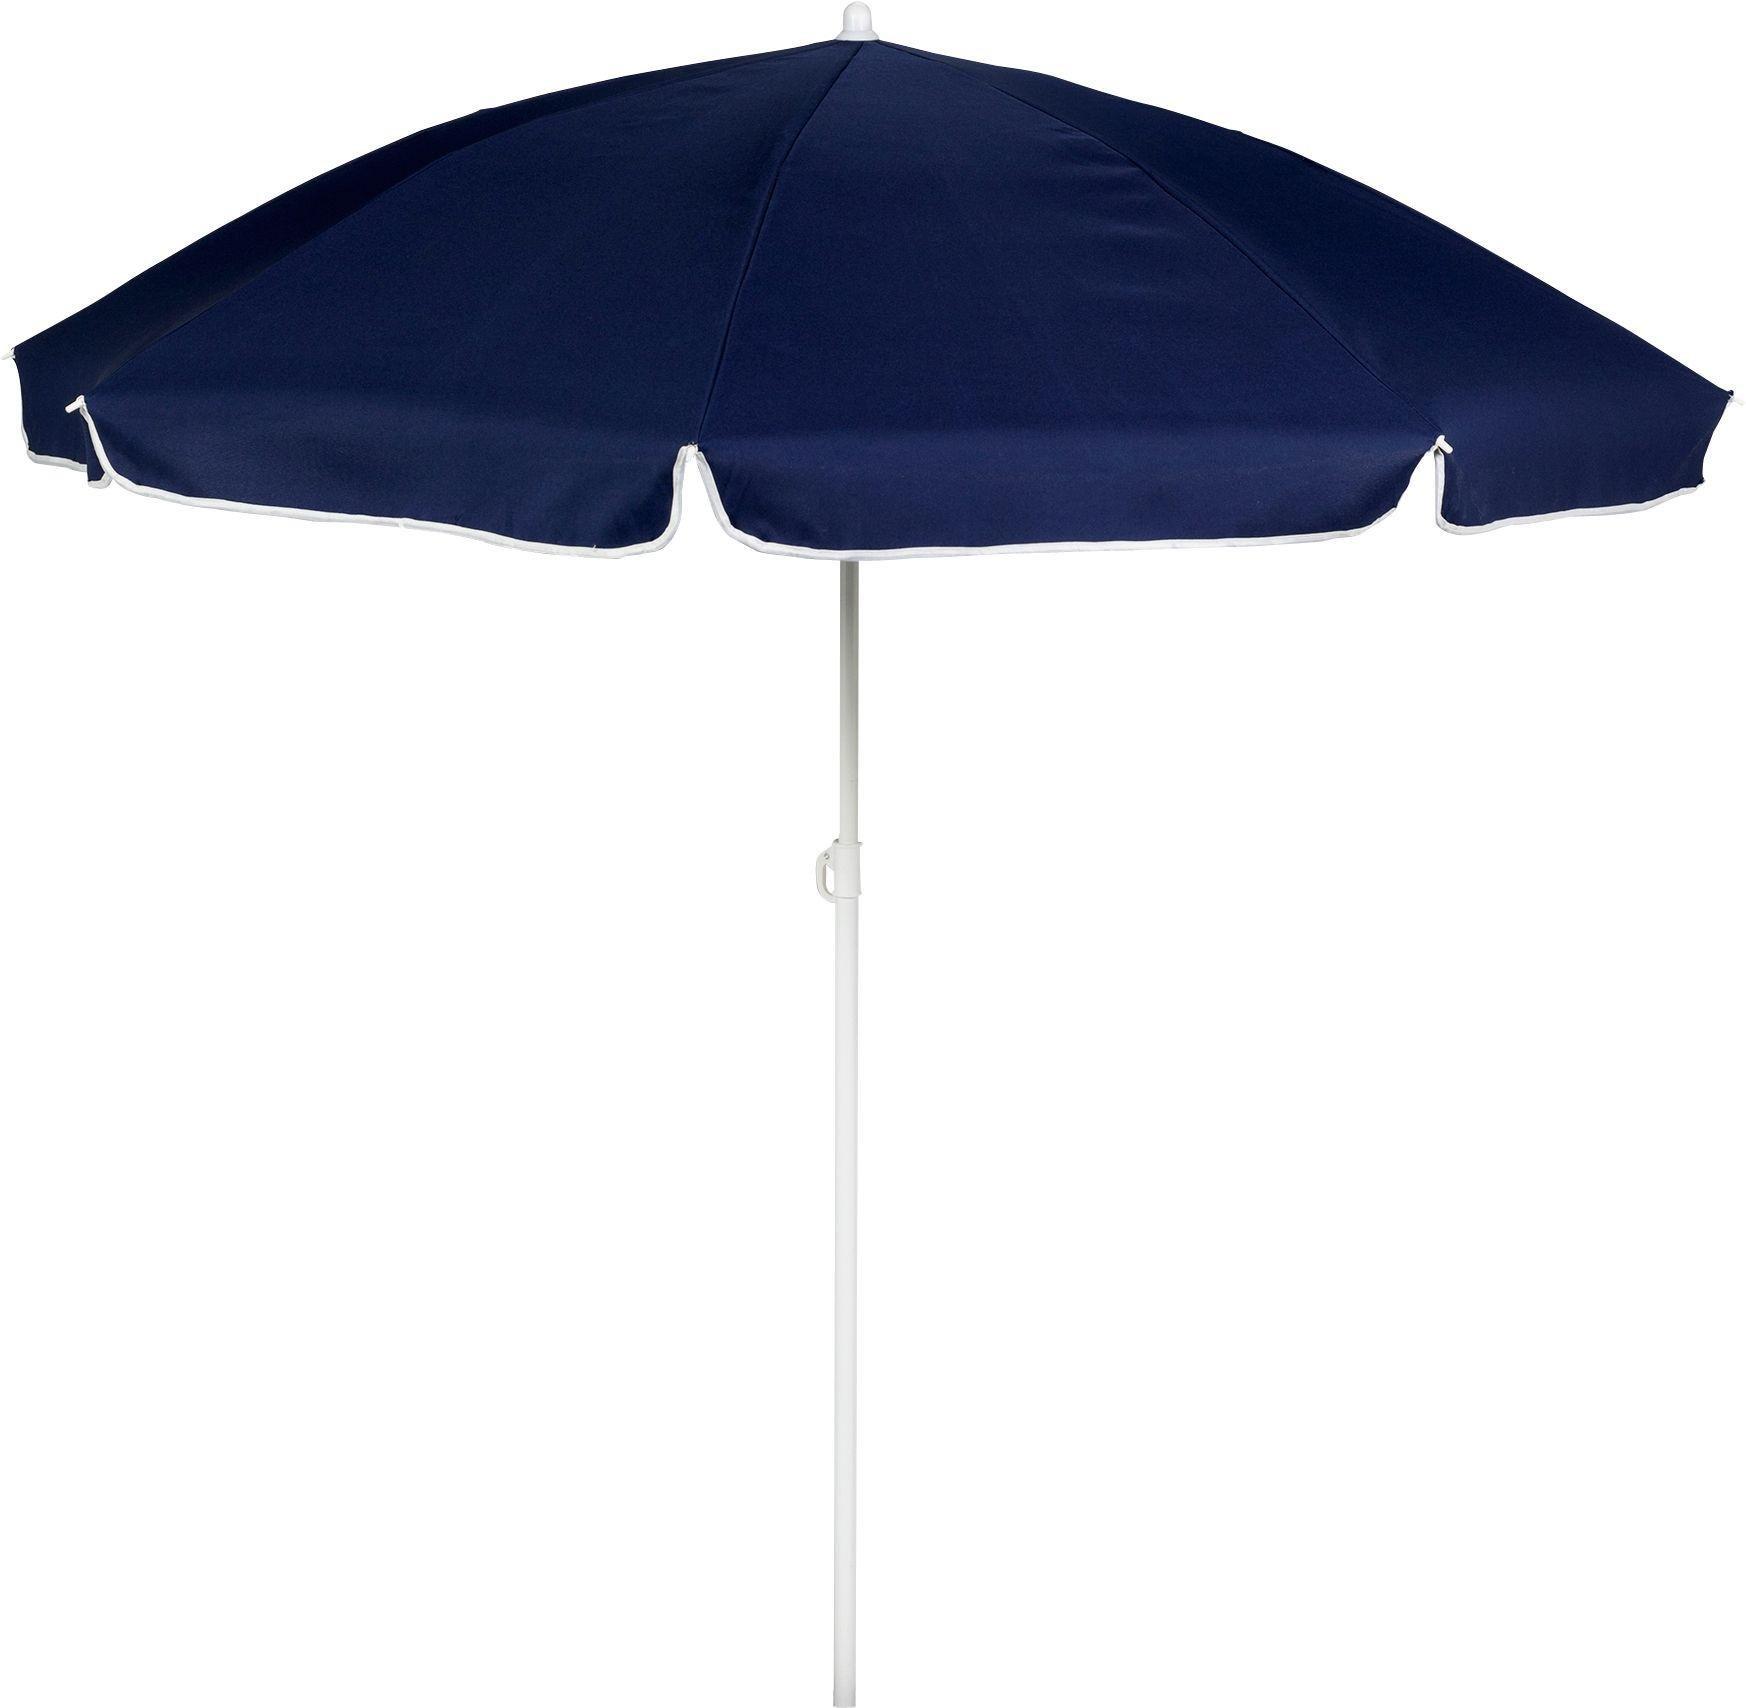 Umbrella Stand Argos Ireland: Find It For Less